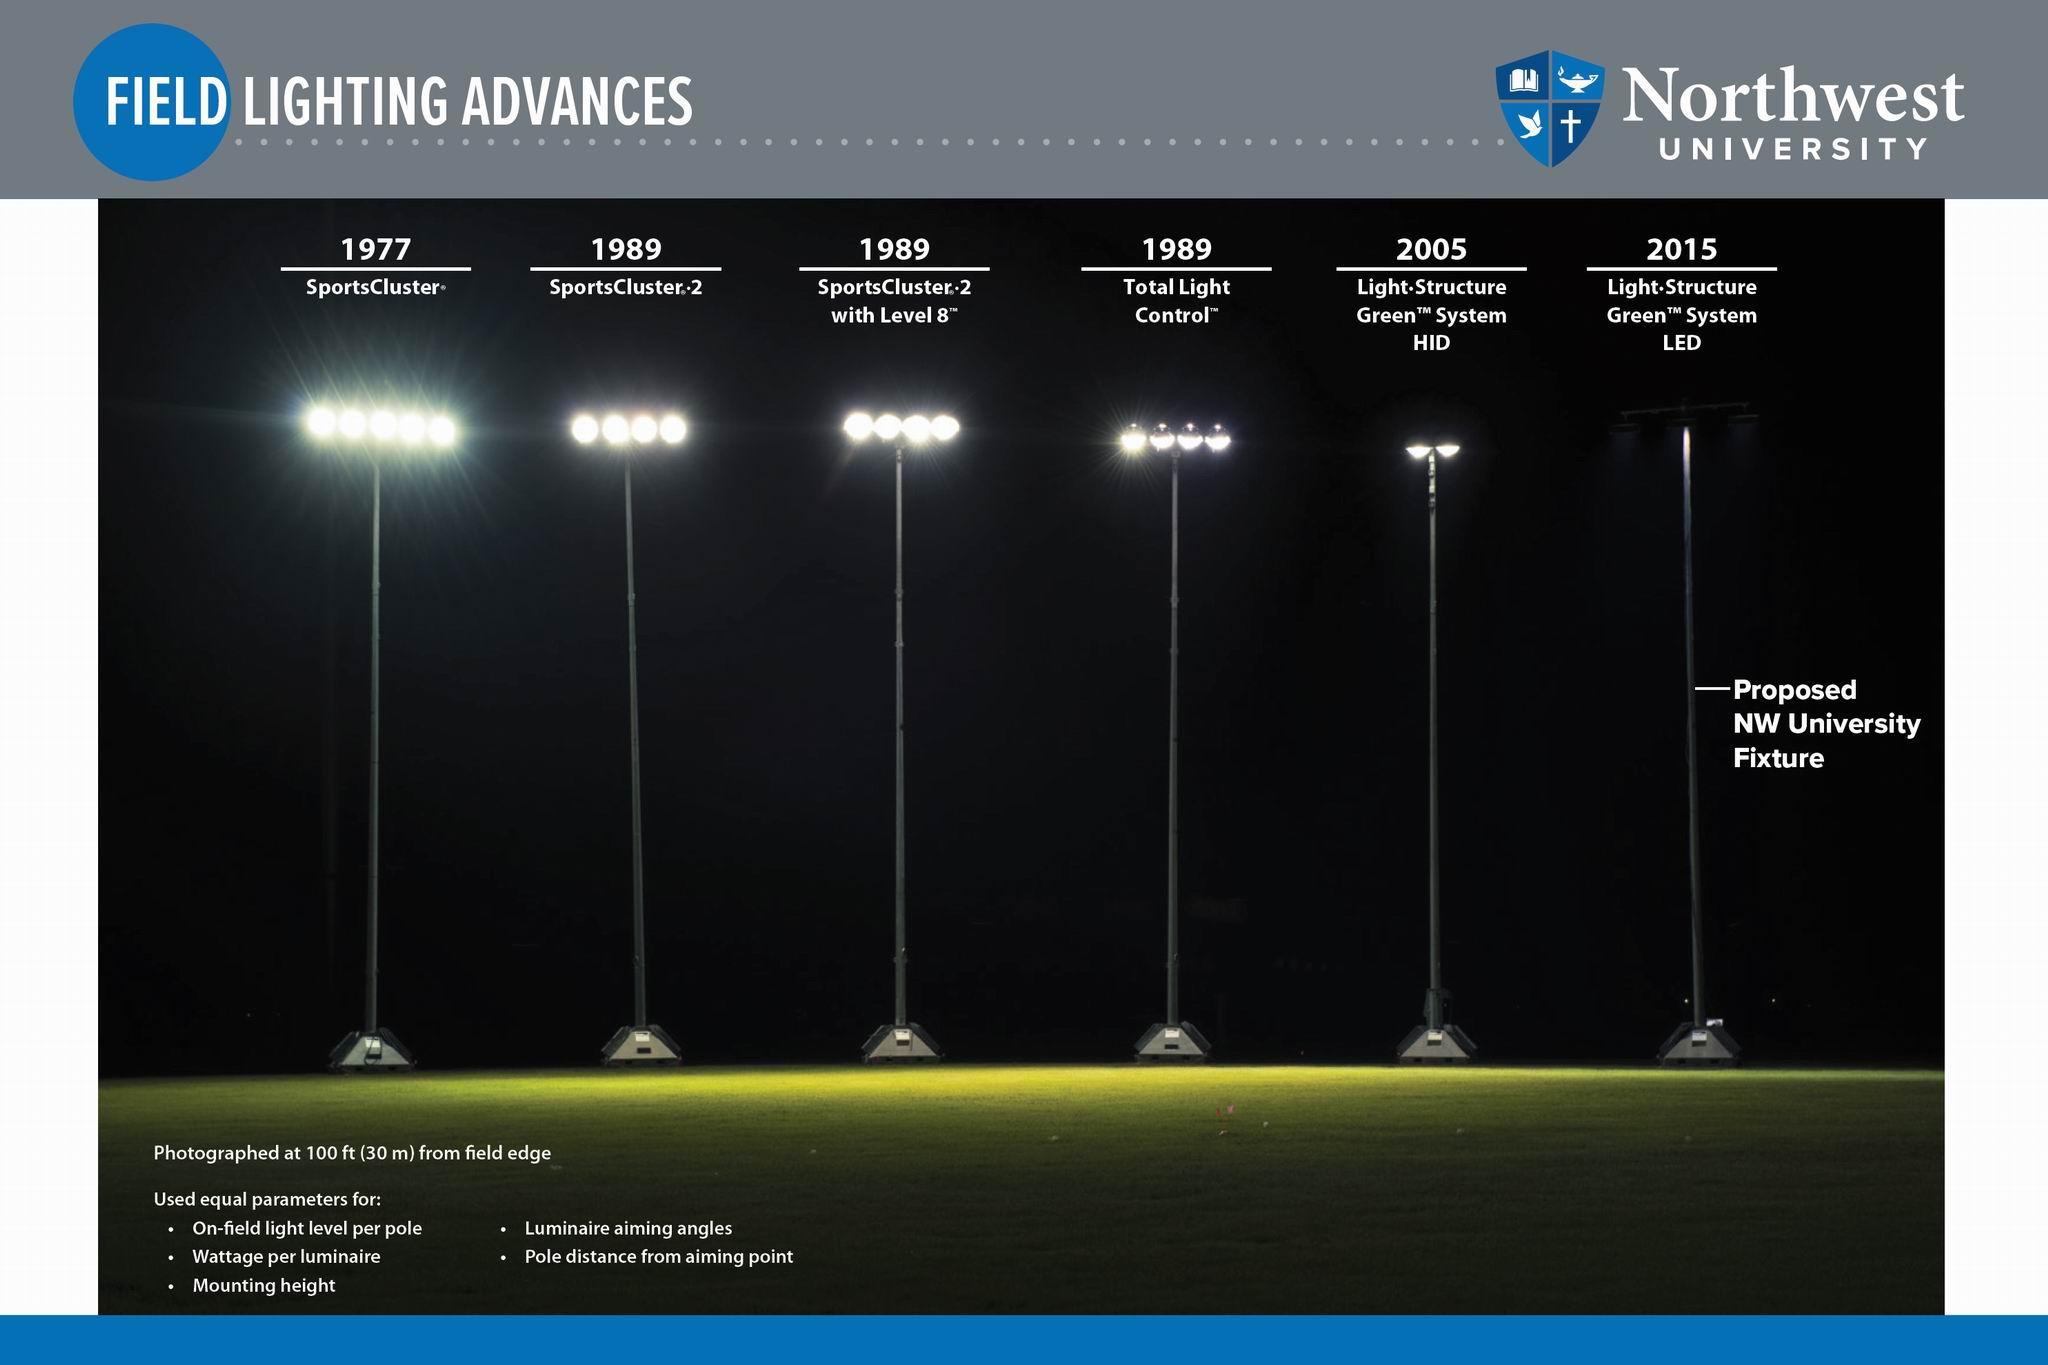 Field Lighting Advances